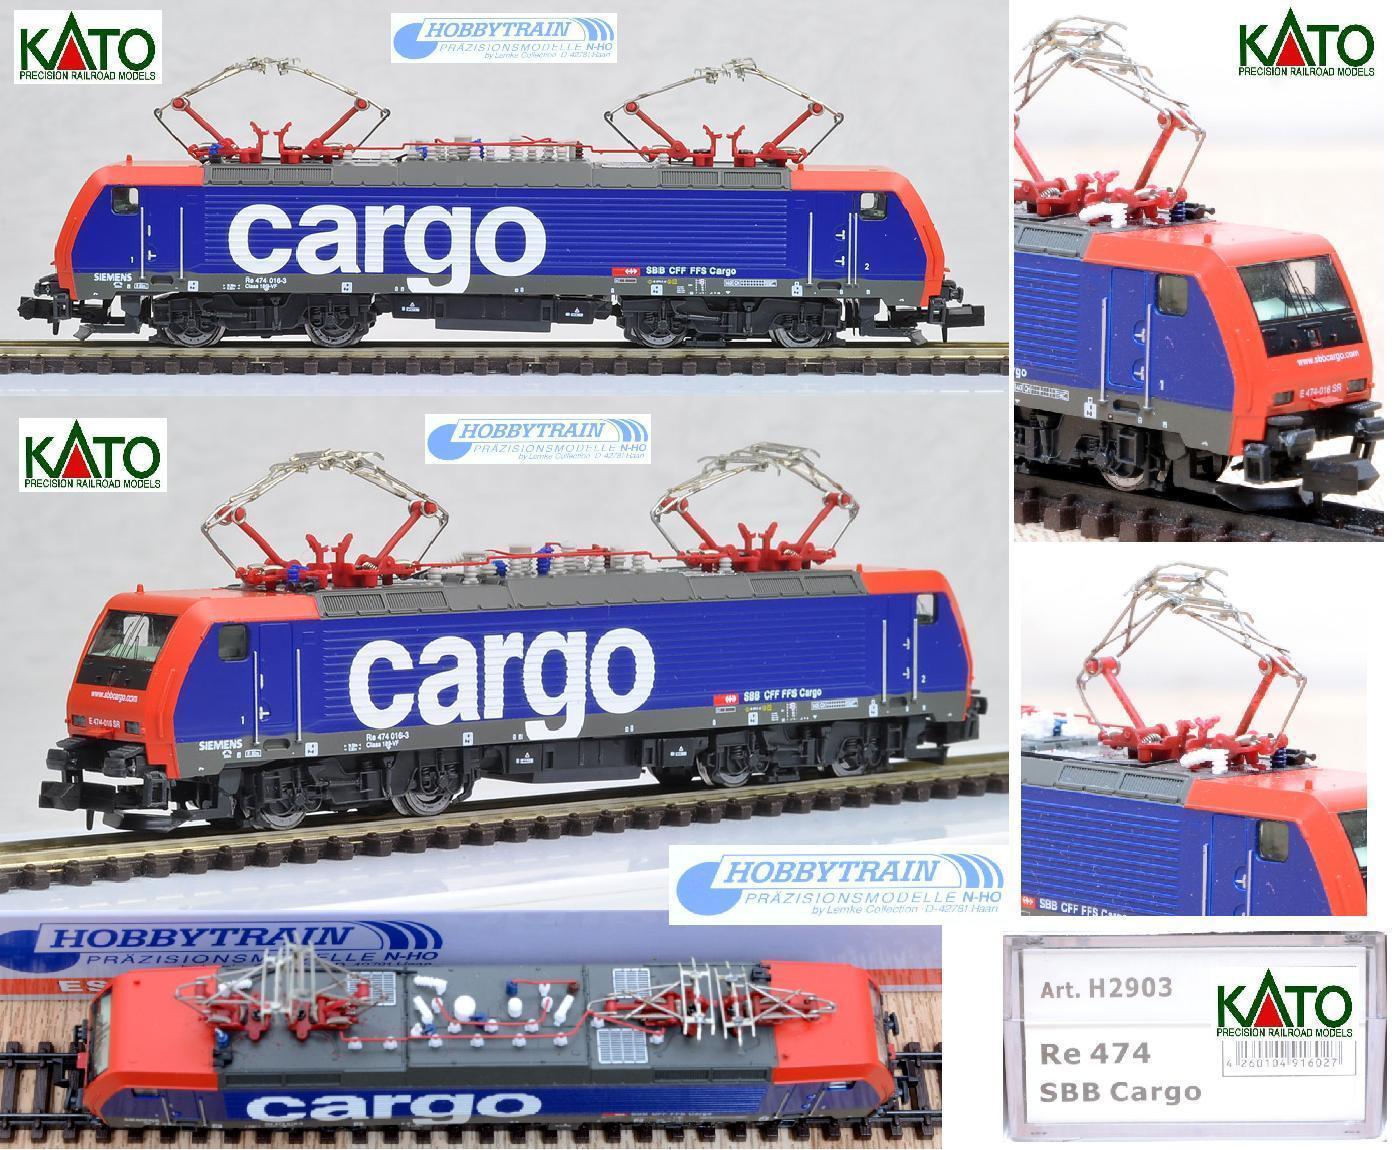 KATO-HOBBYTRAIN H2903 LOCOMOTORE ELETTRICO CARGO Re-474 SBB-CFF-FFS OVP SCALA-N